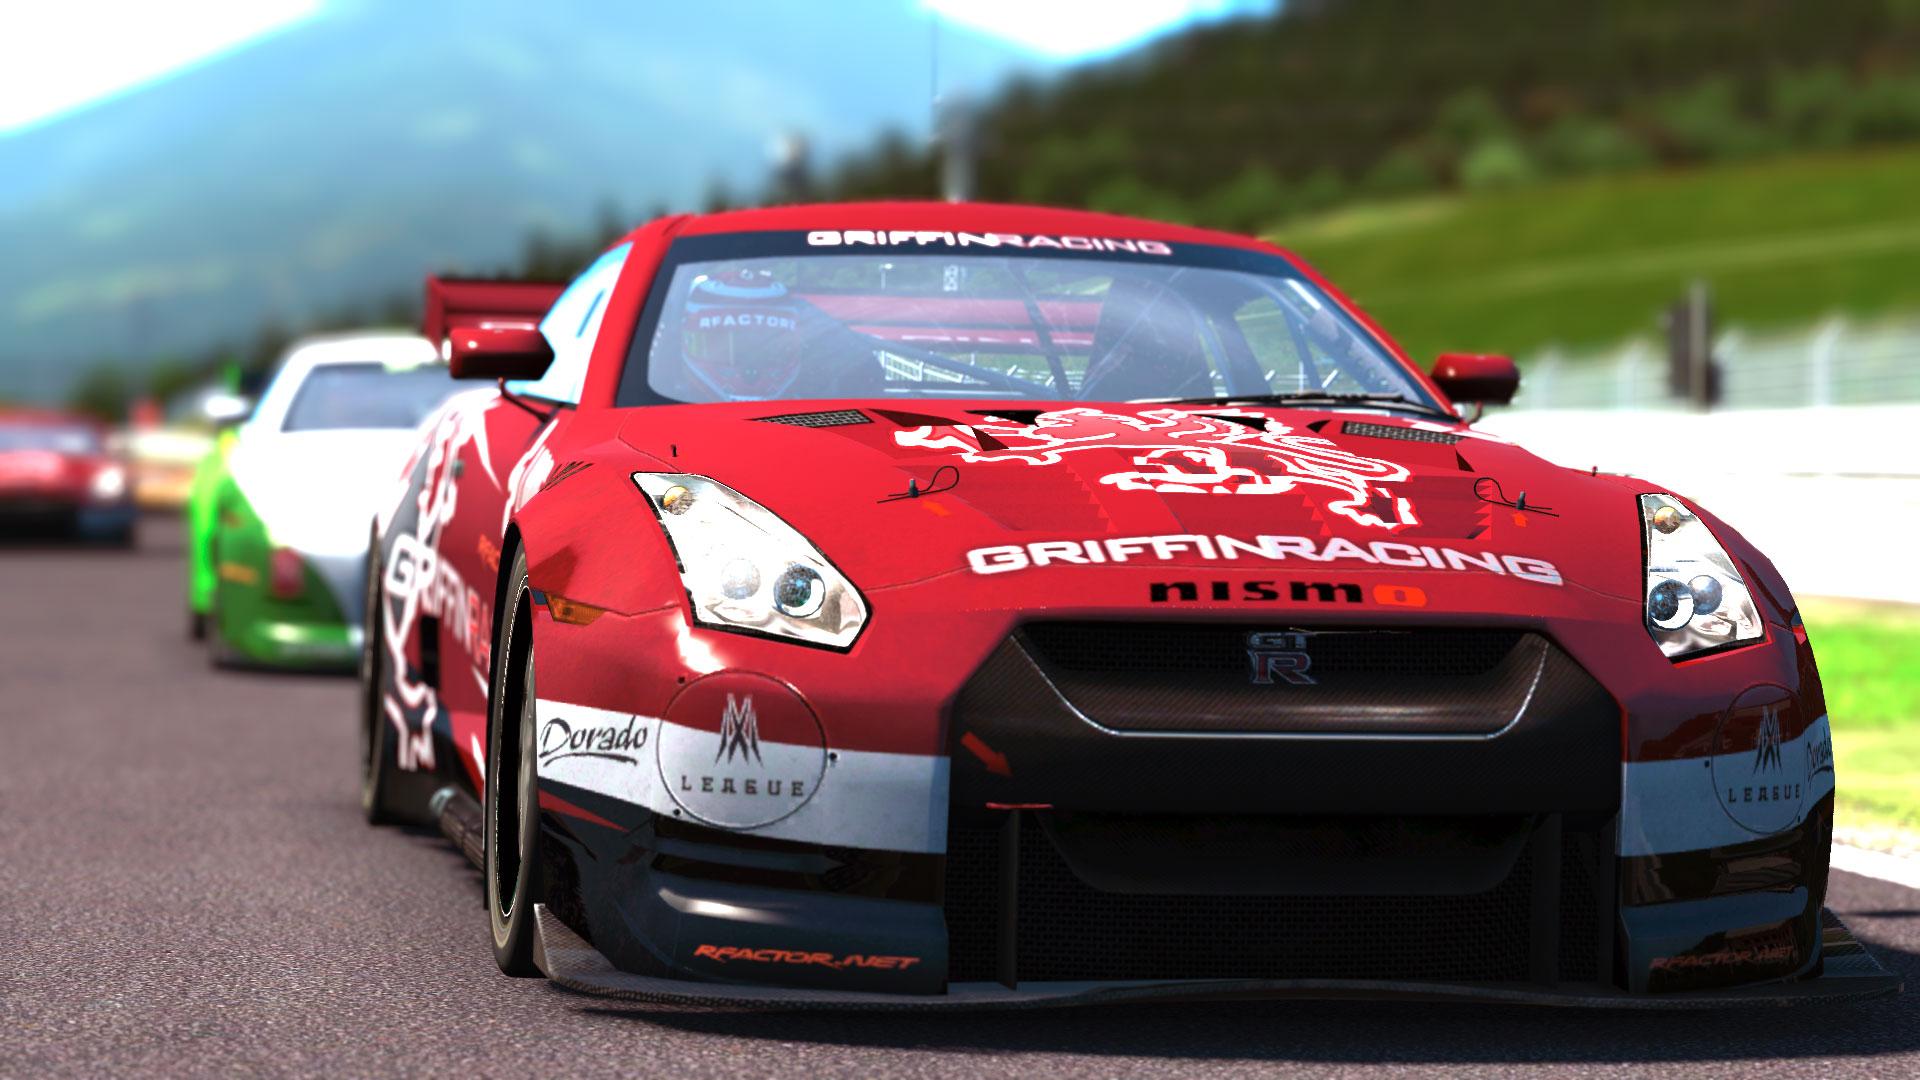 Spa Francorchamps – Nissan GTR RSC – (2/10)